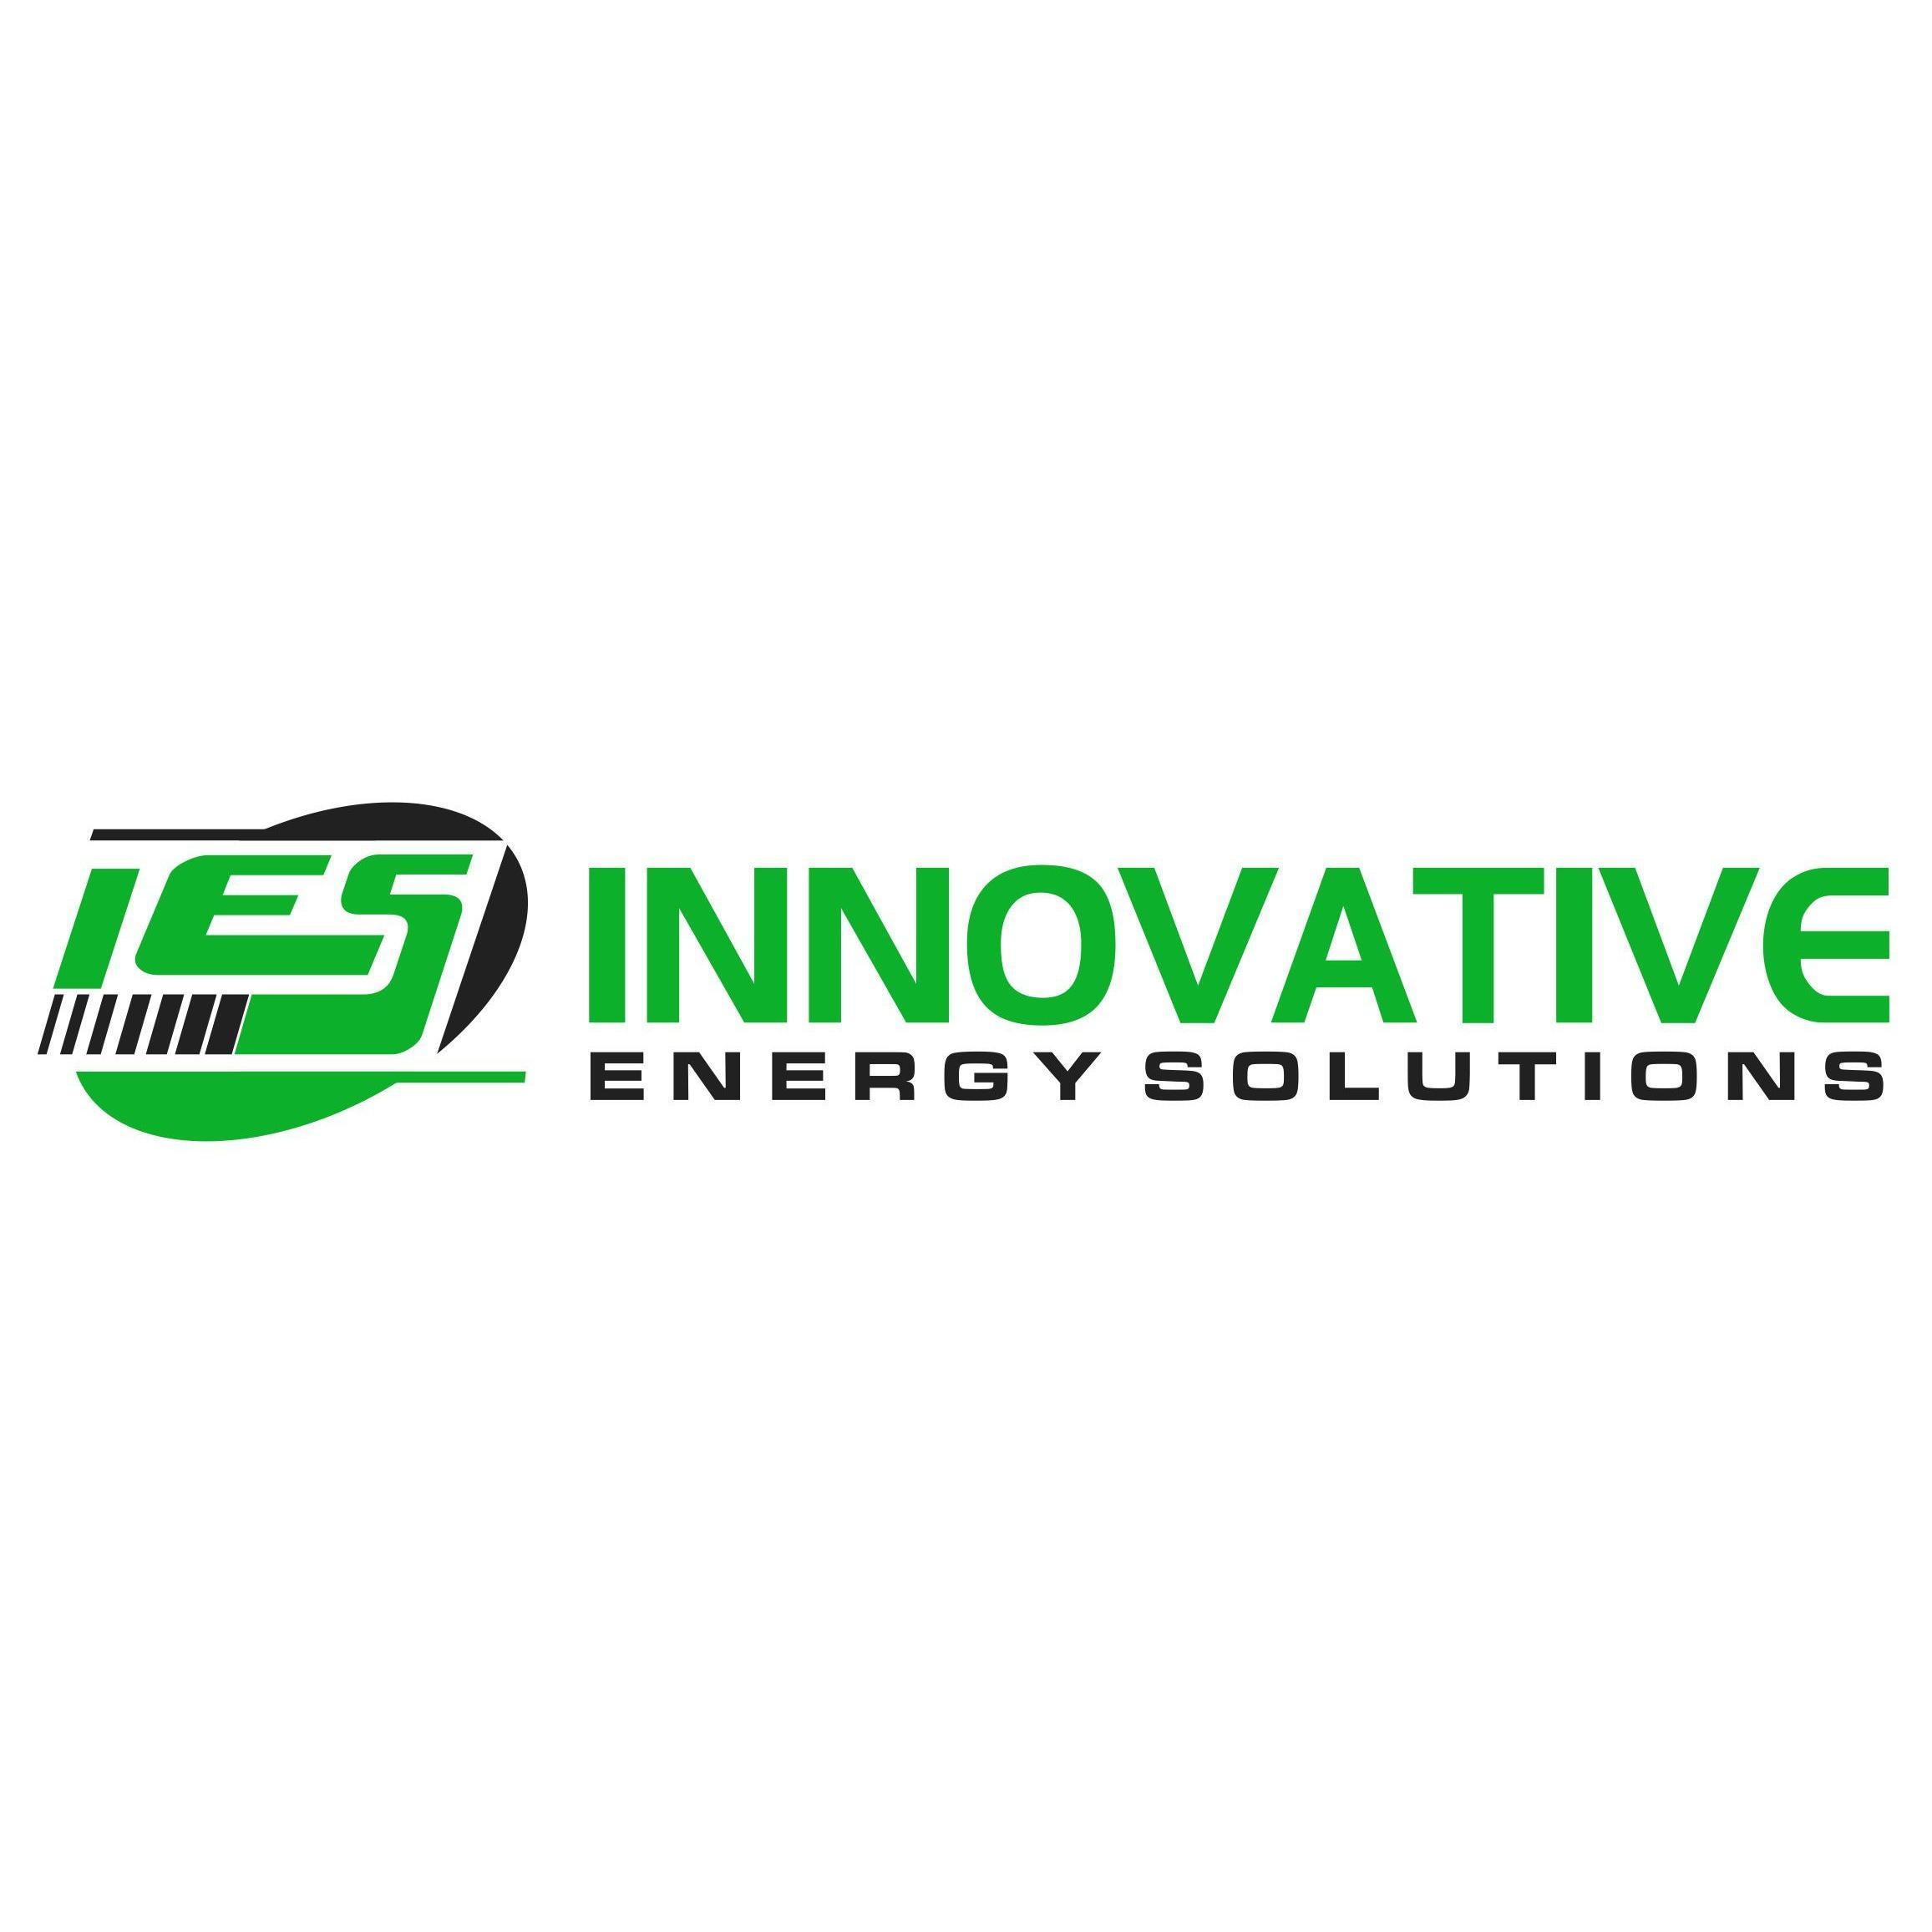 Innovative Energy Solutions